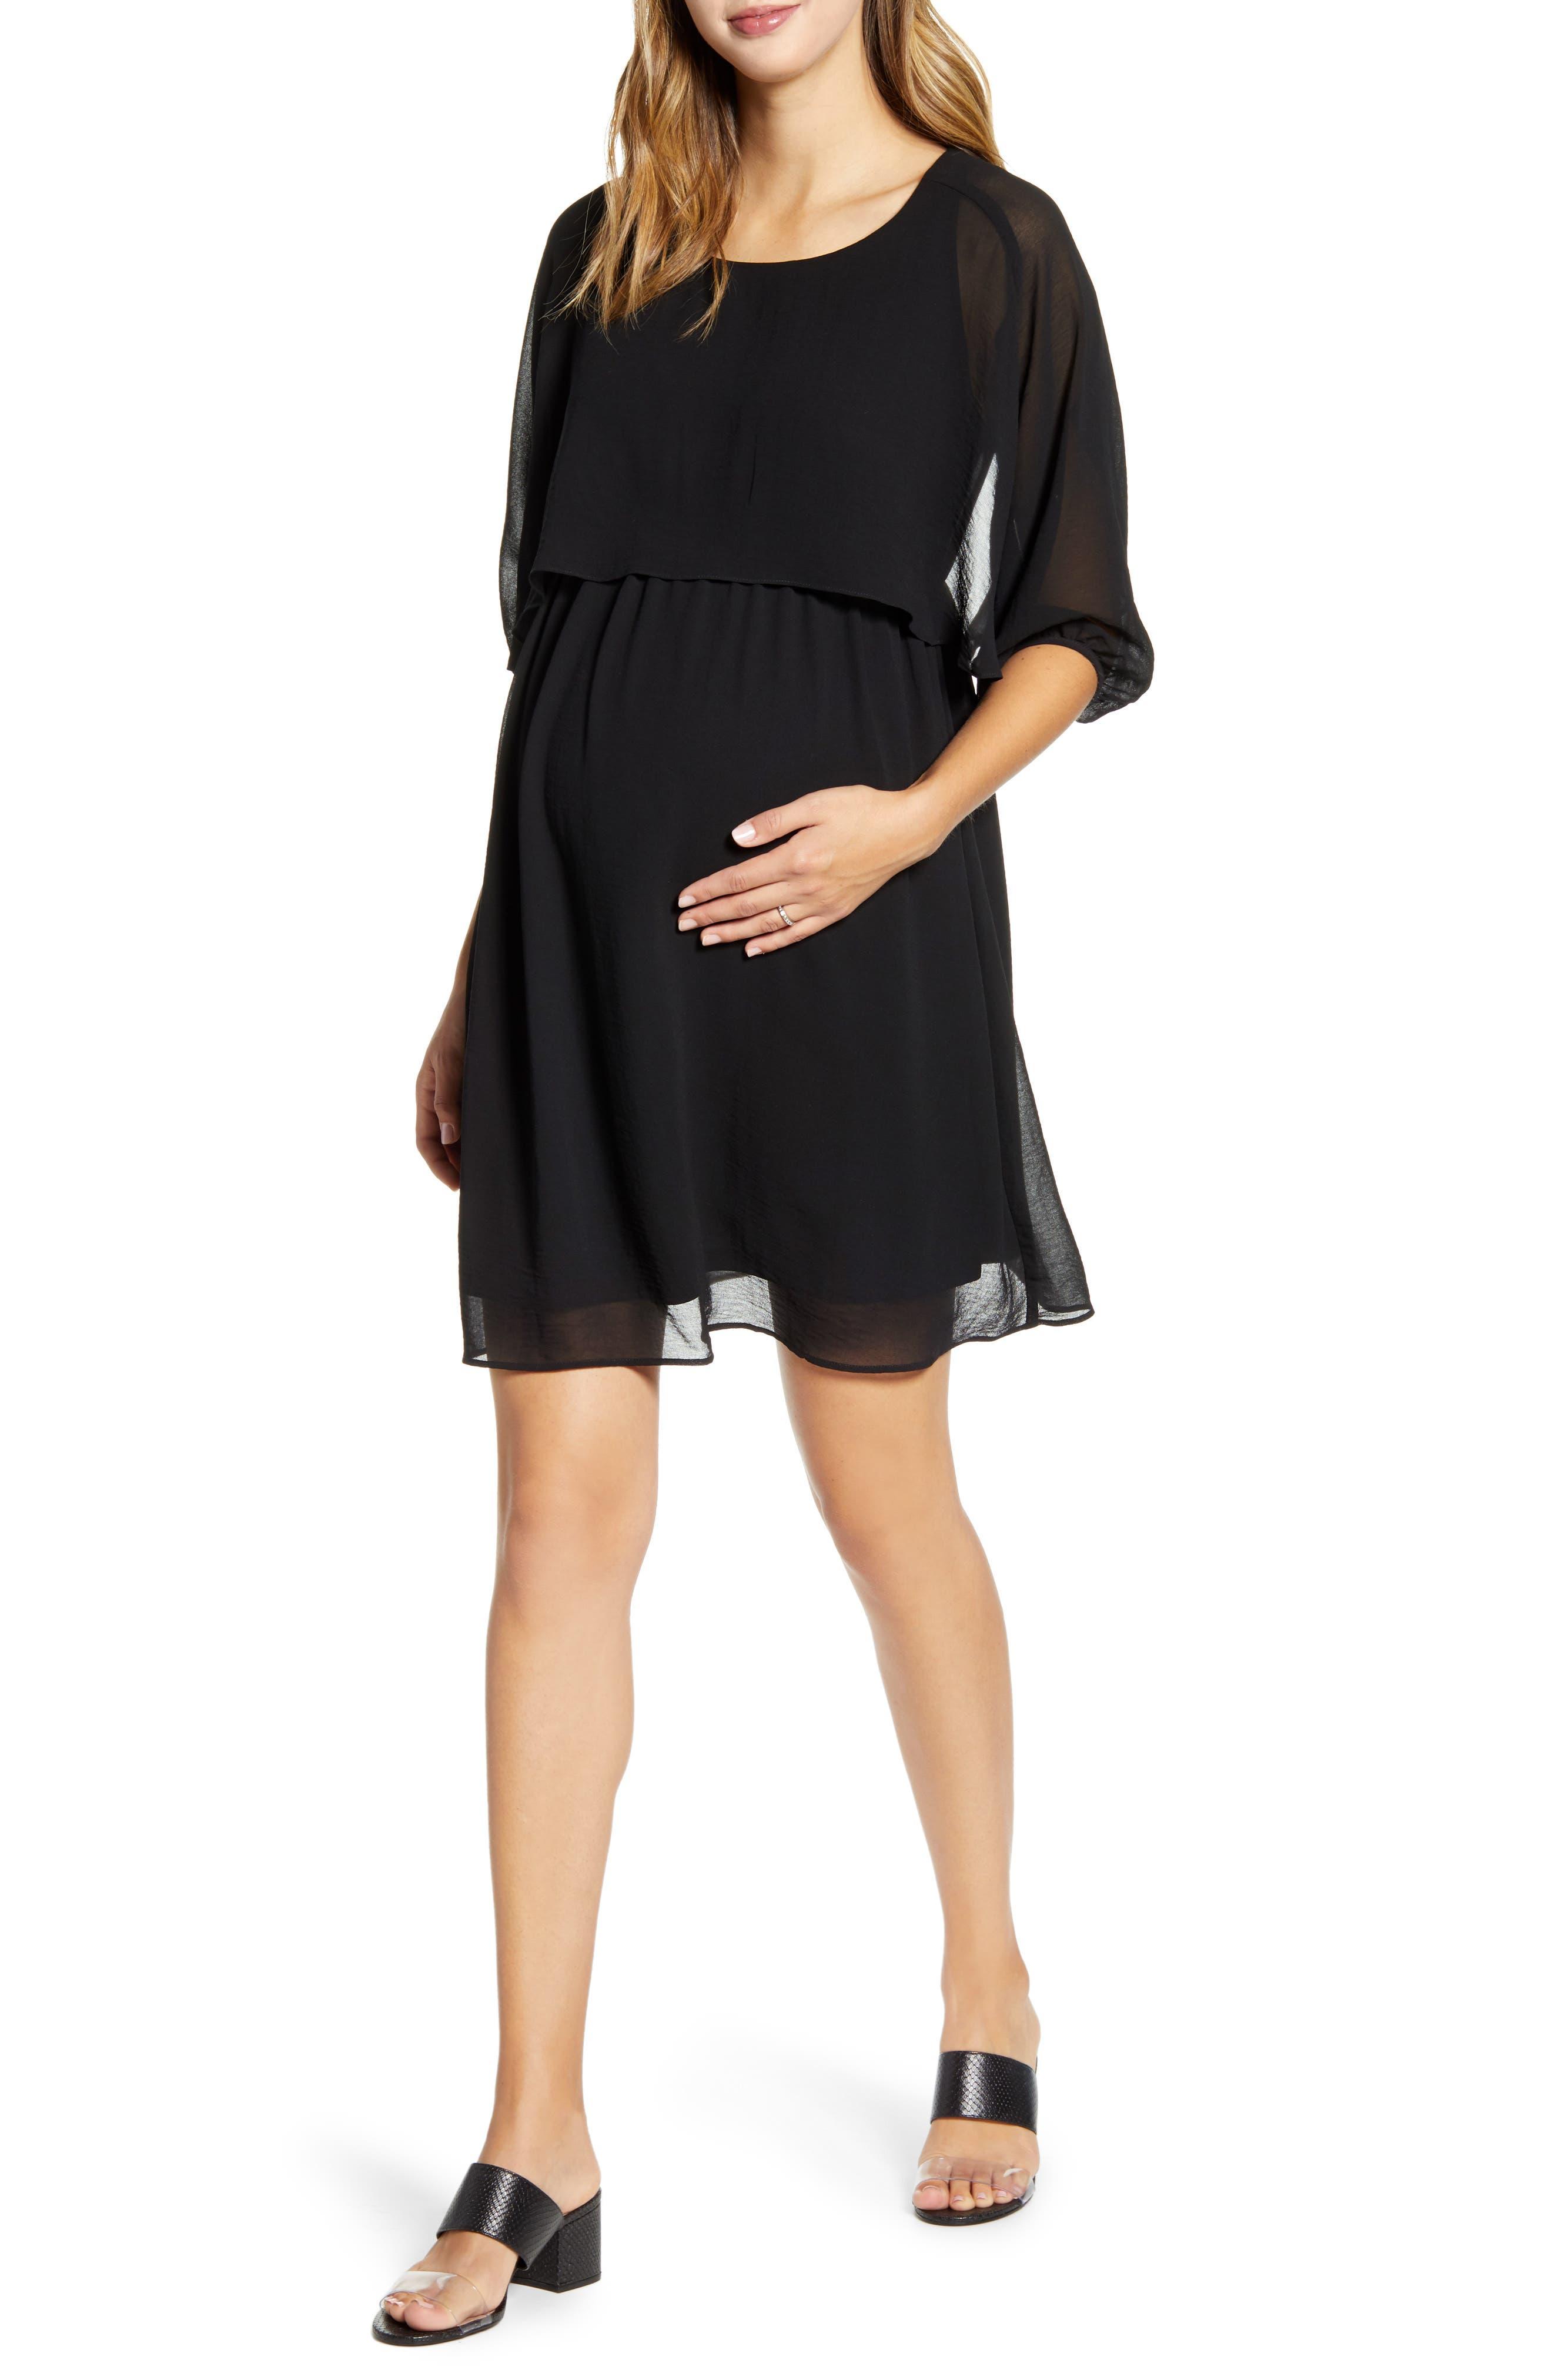 Ruffle Overlay Maternity/nursing Dress